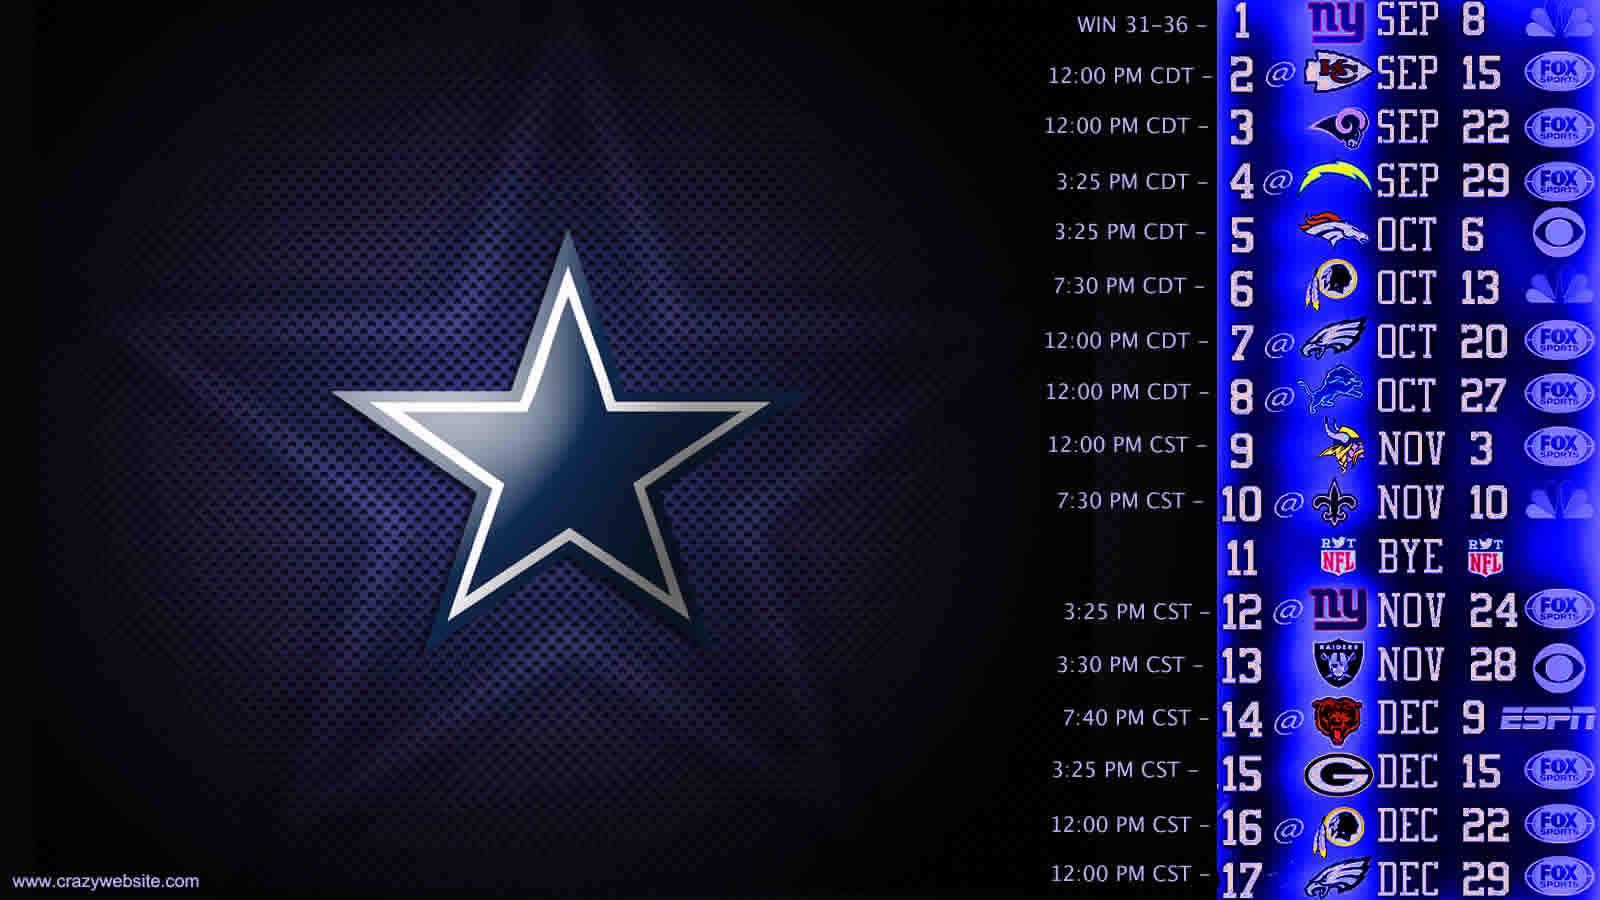 dallas cowboys schedule desktop wallpaper wallpapersafari